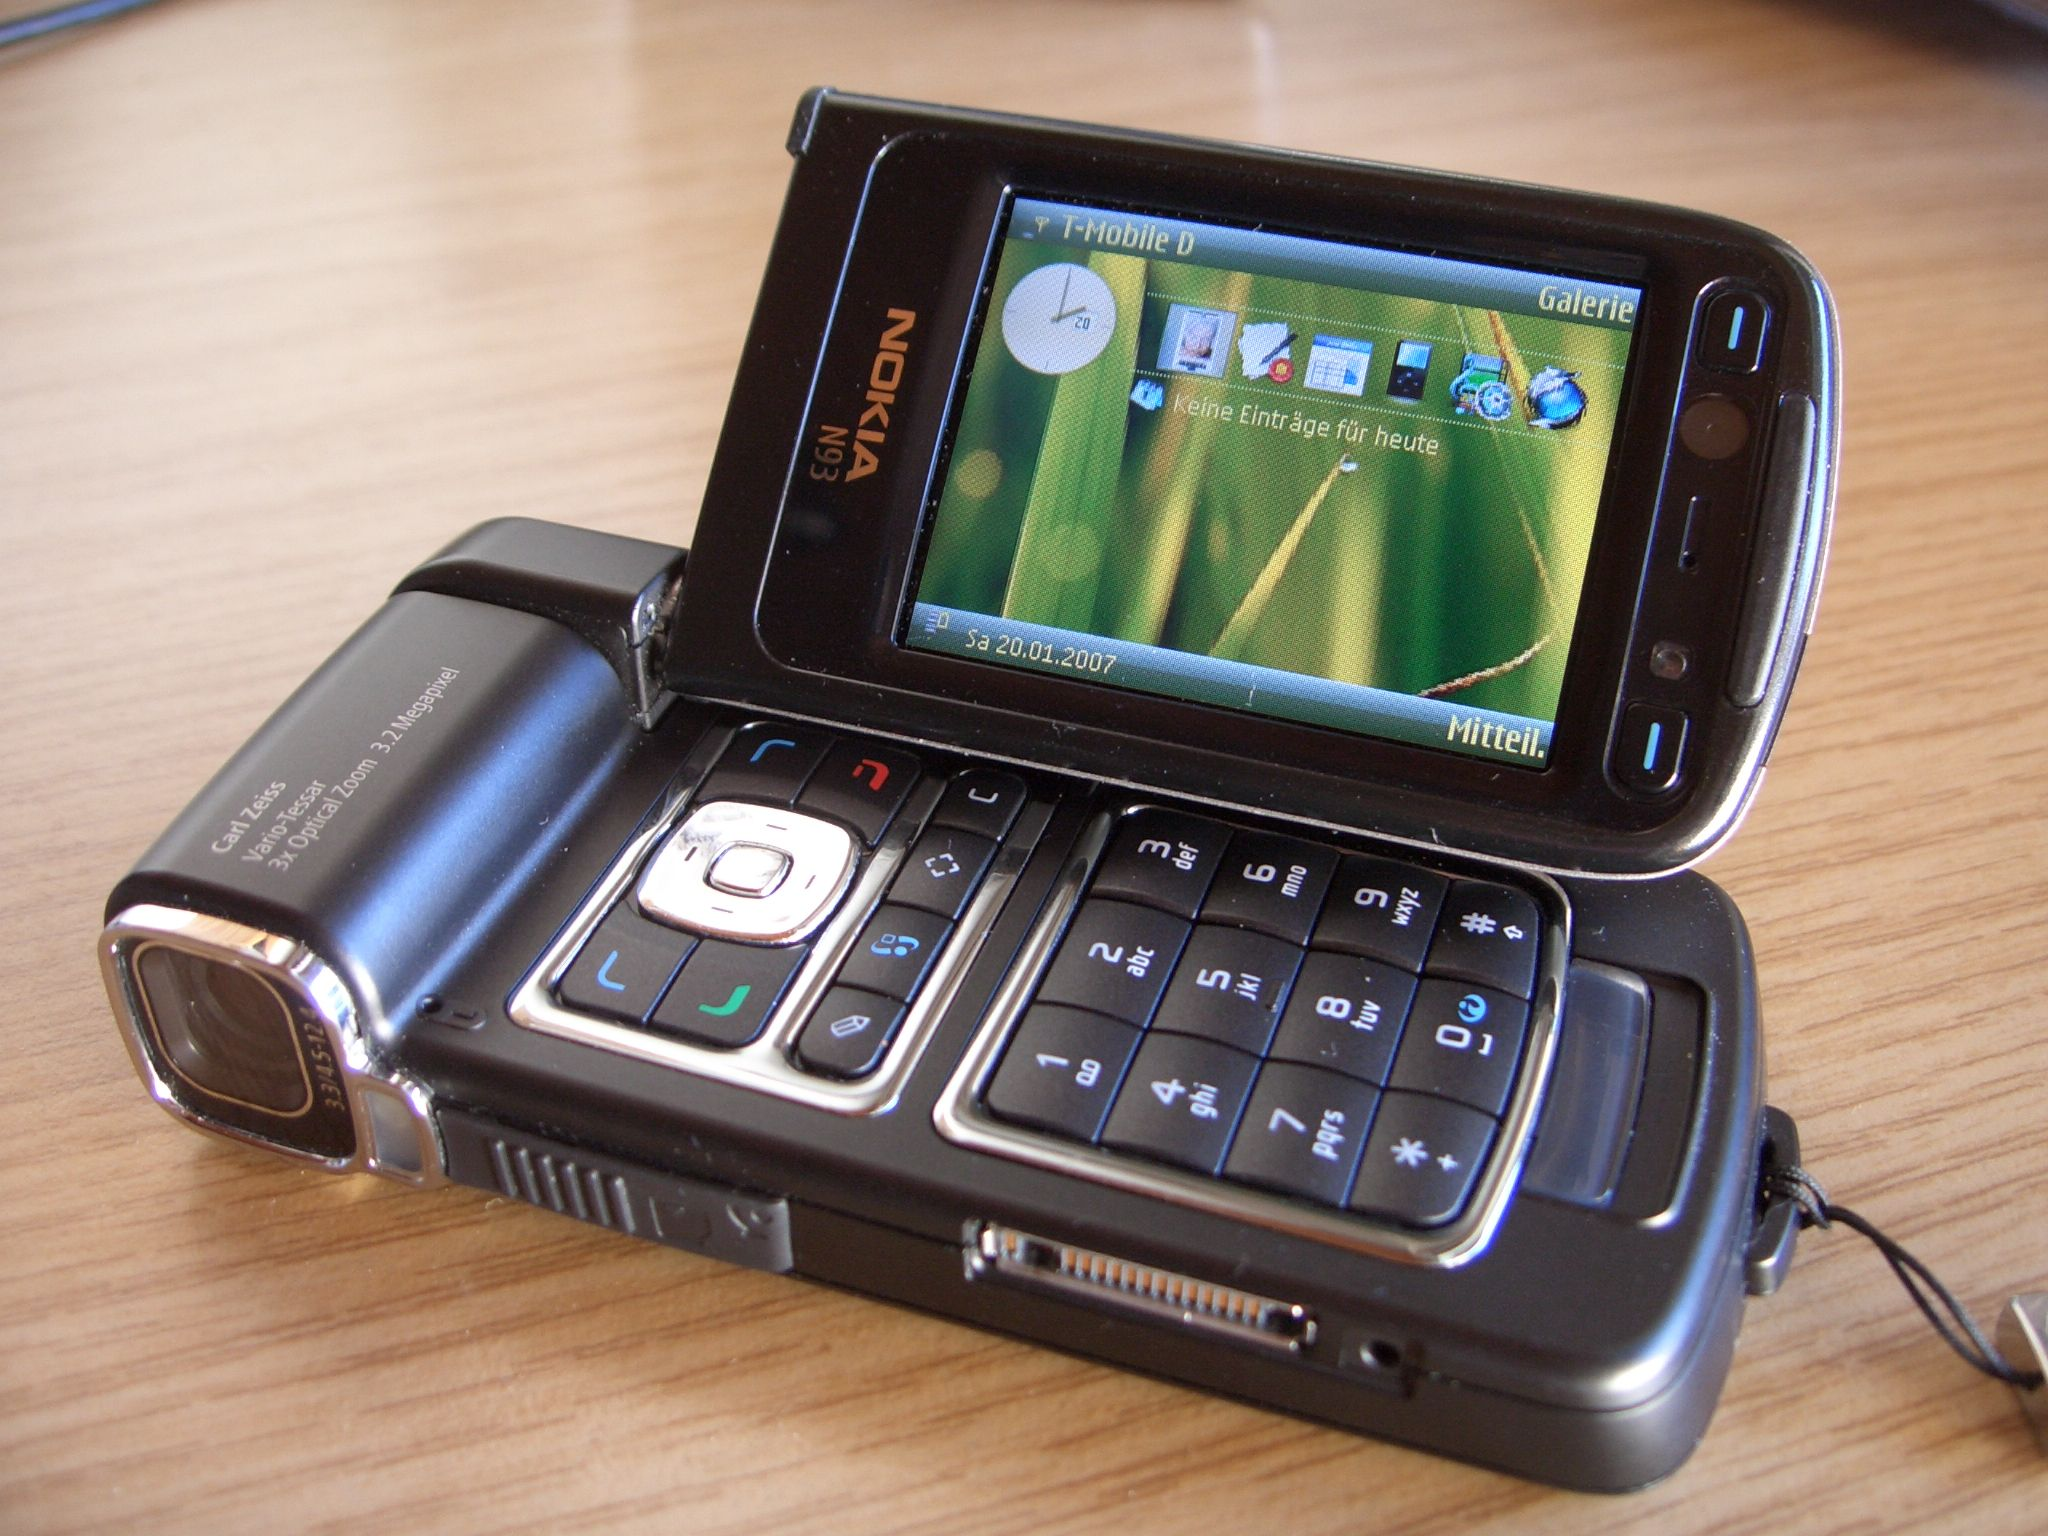 nokia n93 google search telephones pinterest mobile technology rh pinterest com Nokia N70 Nokia N95